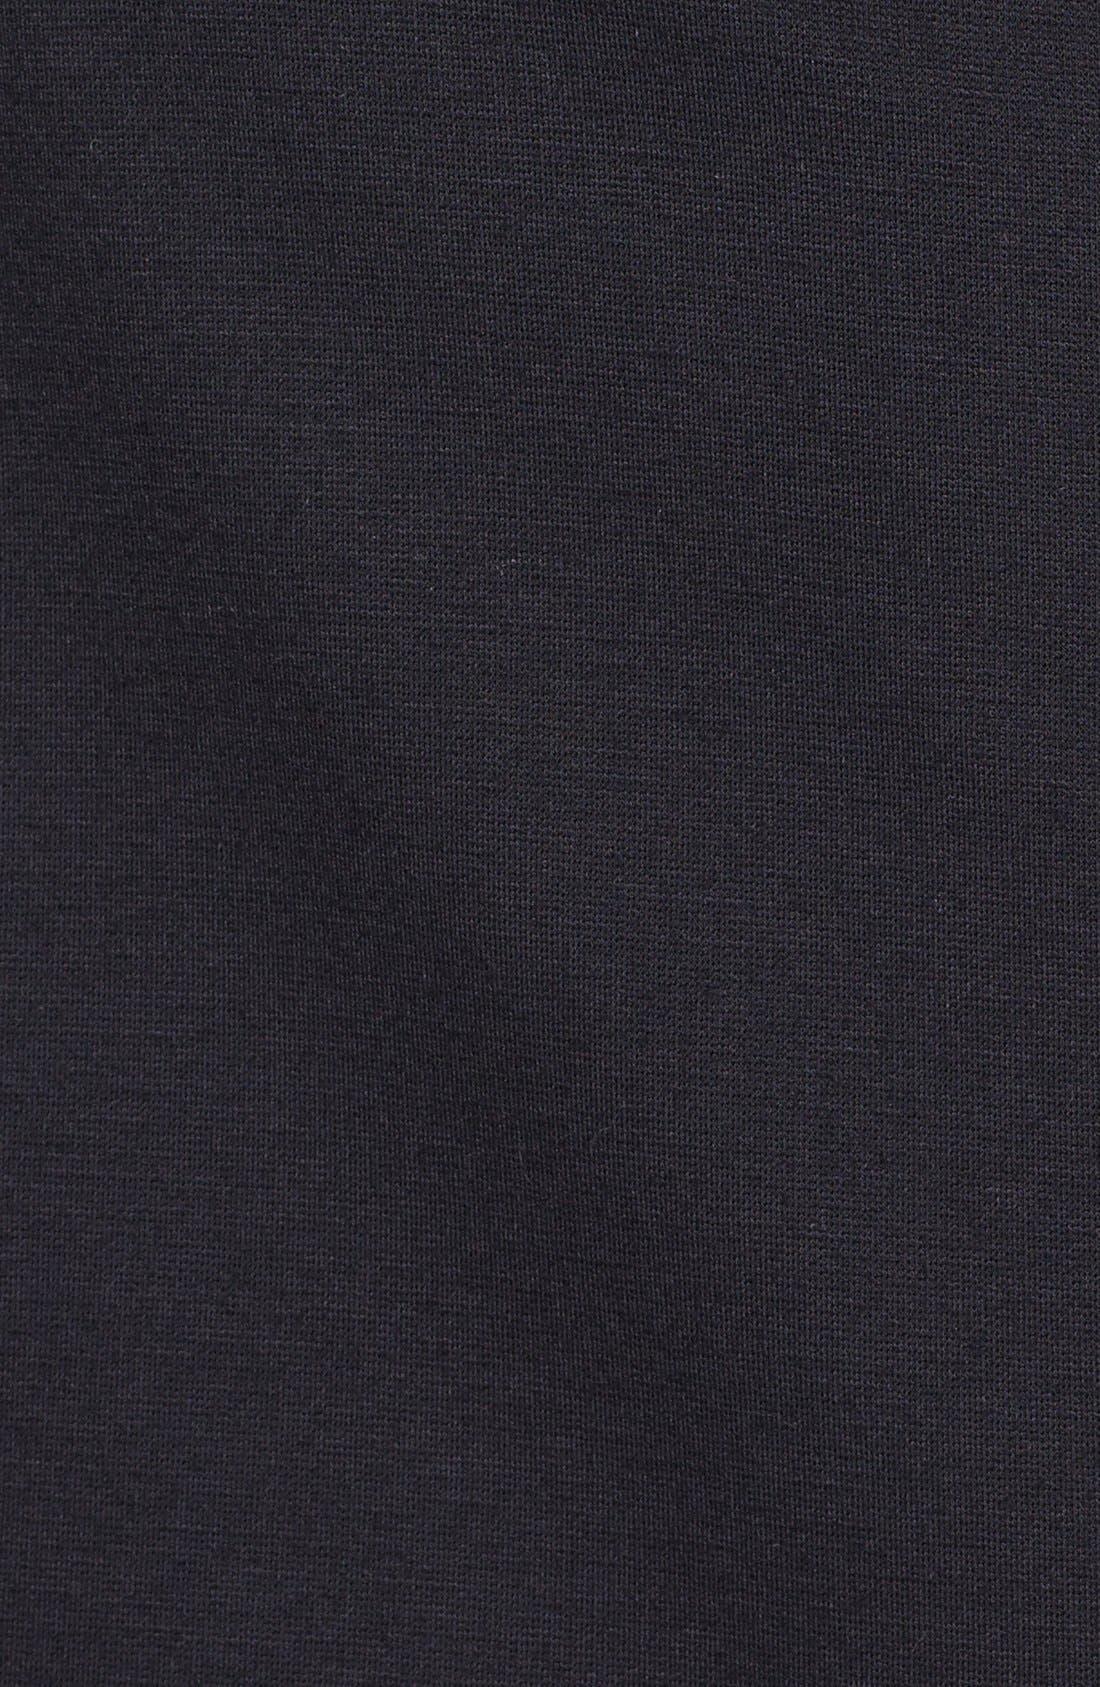 Alternate Image 3  - Vince Camuto Fluted Miniskirt